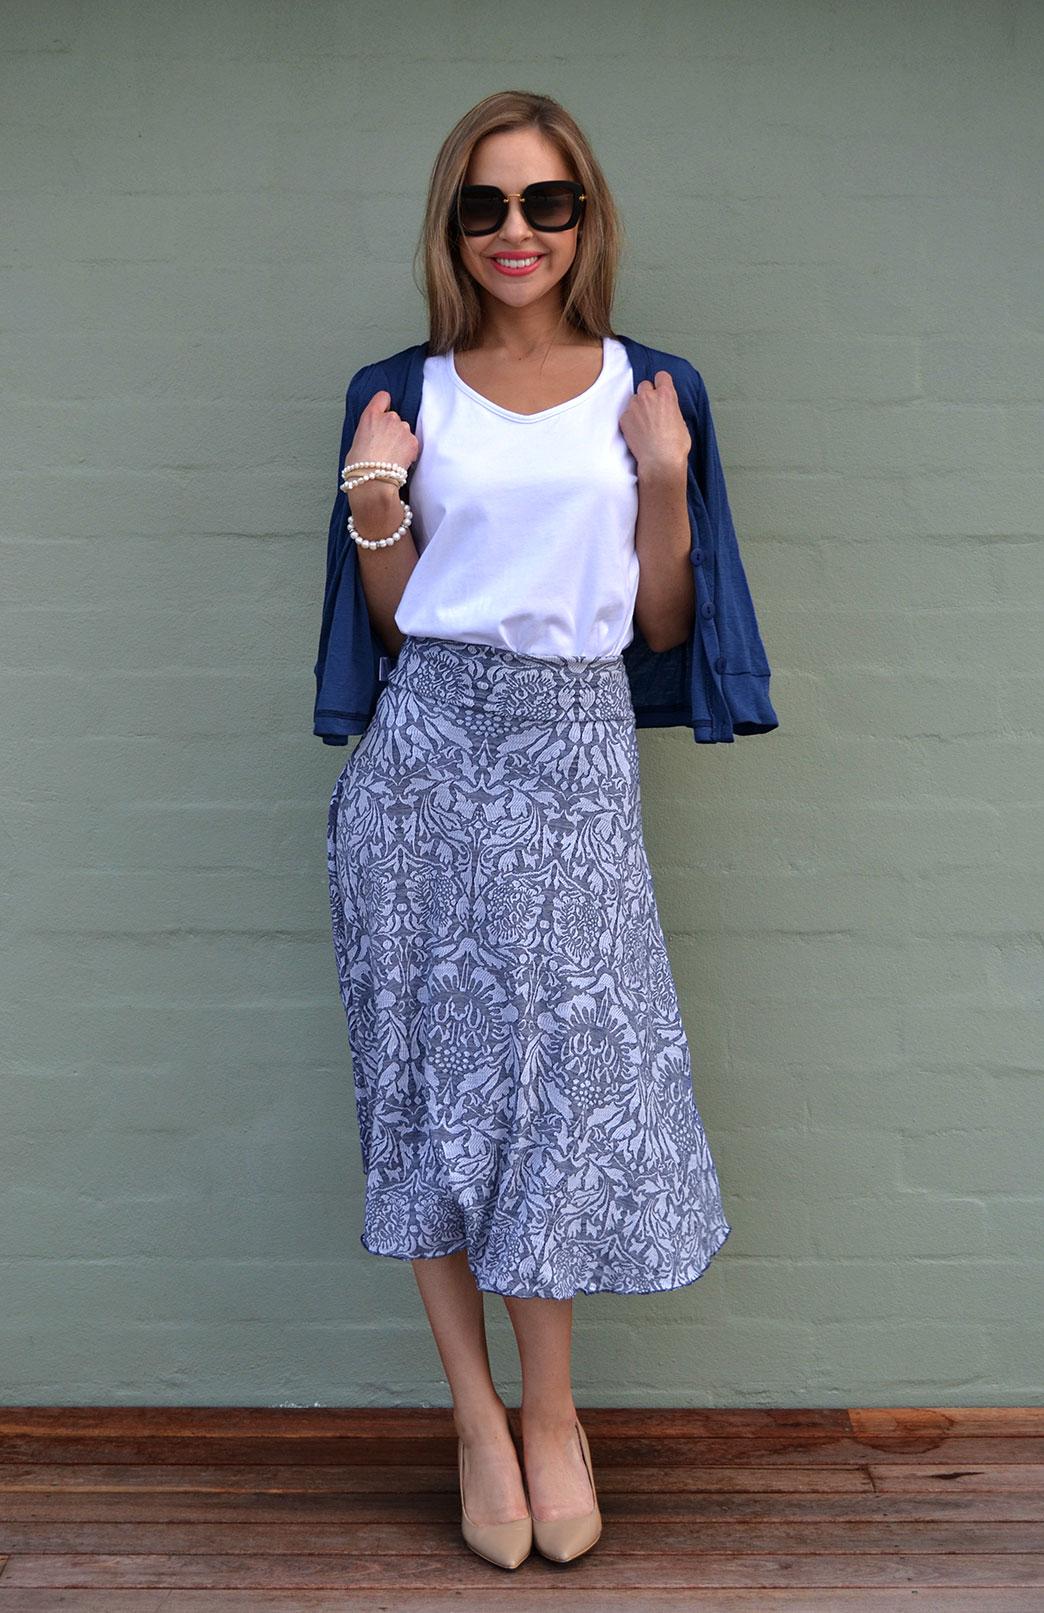 Twirl Skirt - Women's Blue Floral A-Line Swing Wool Skirt - Smitten Merino Tasmania Australia